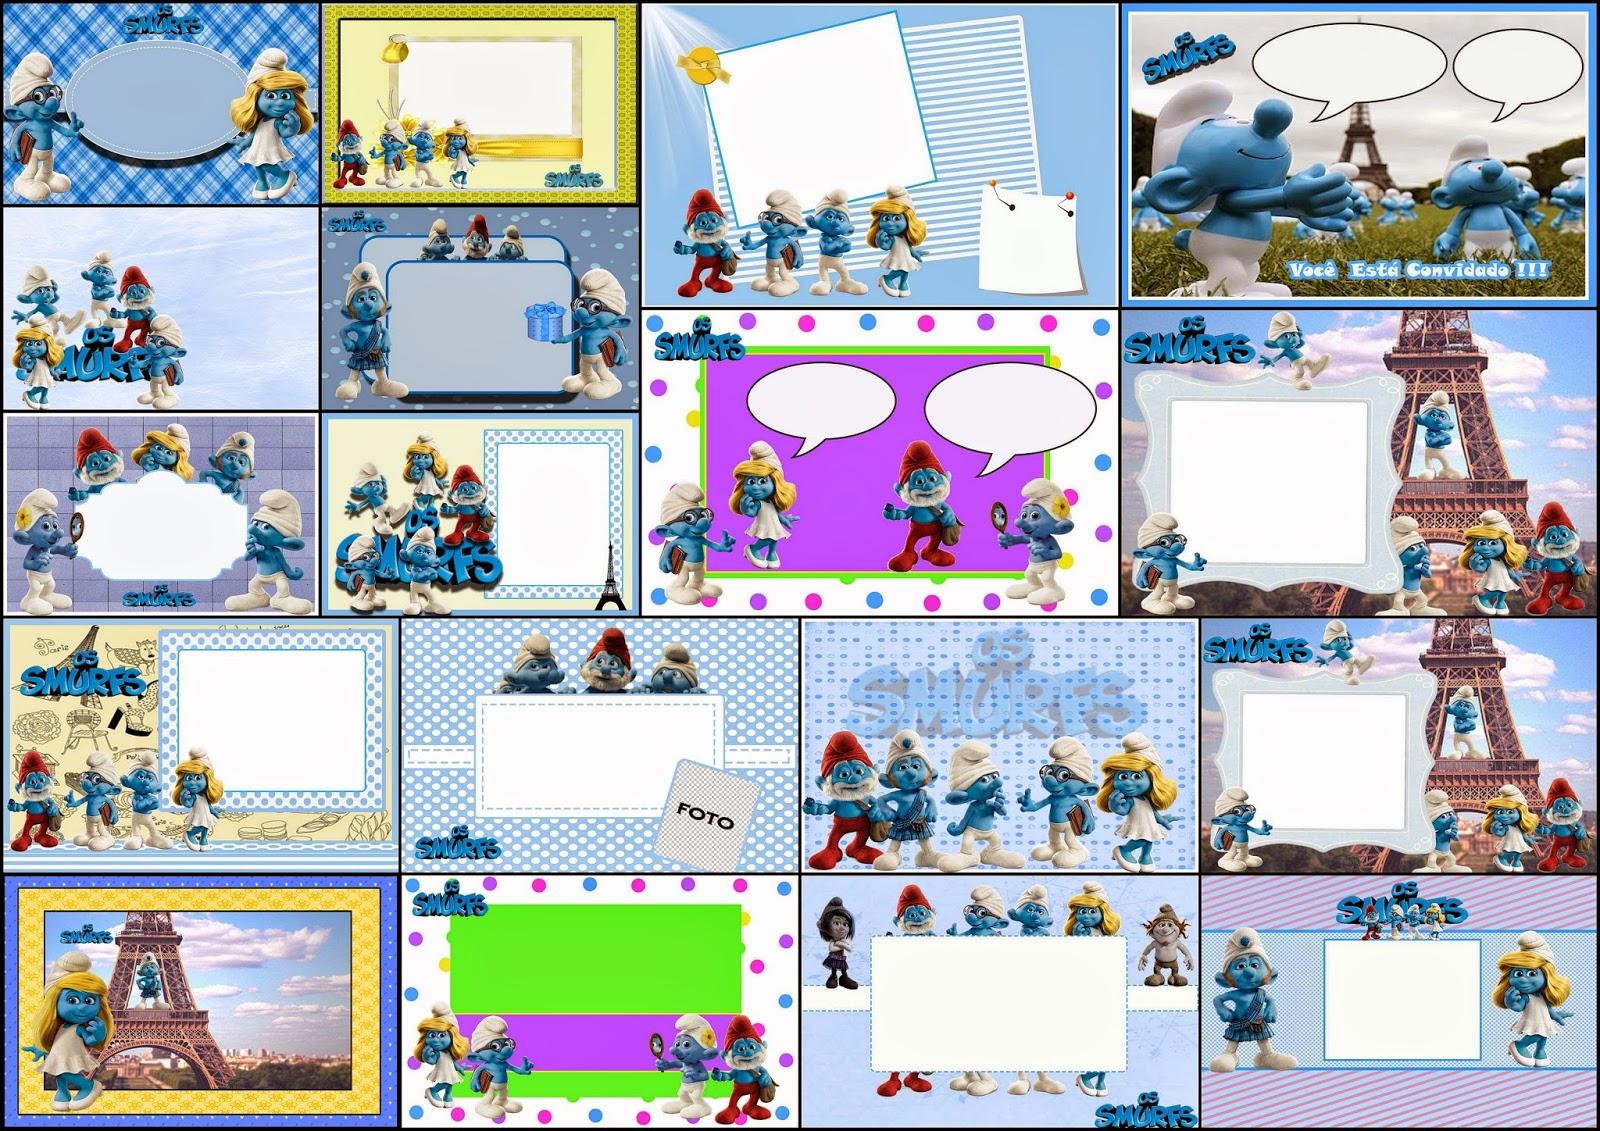 4689db5c9671 The Smurfs Free  Printable Invitations or Photo Frames.